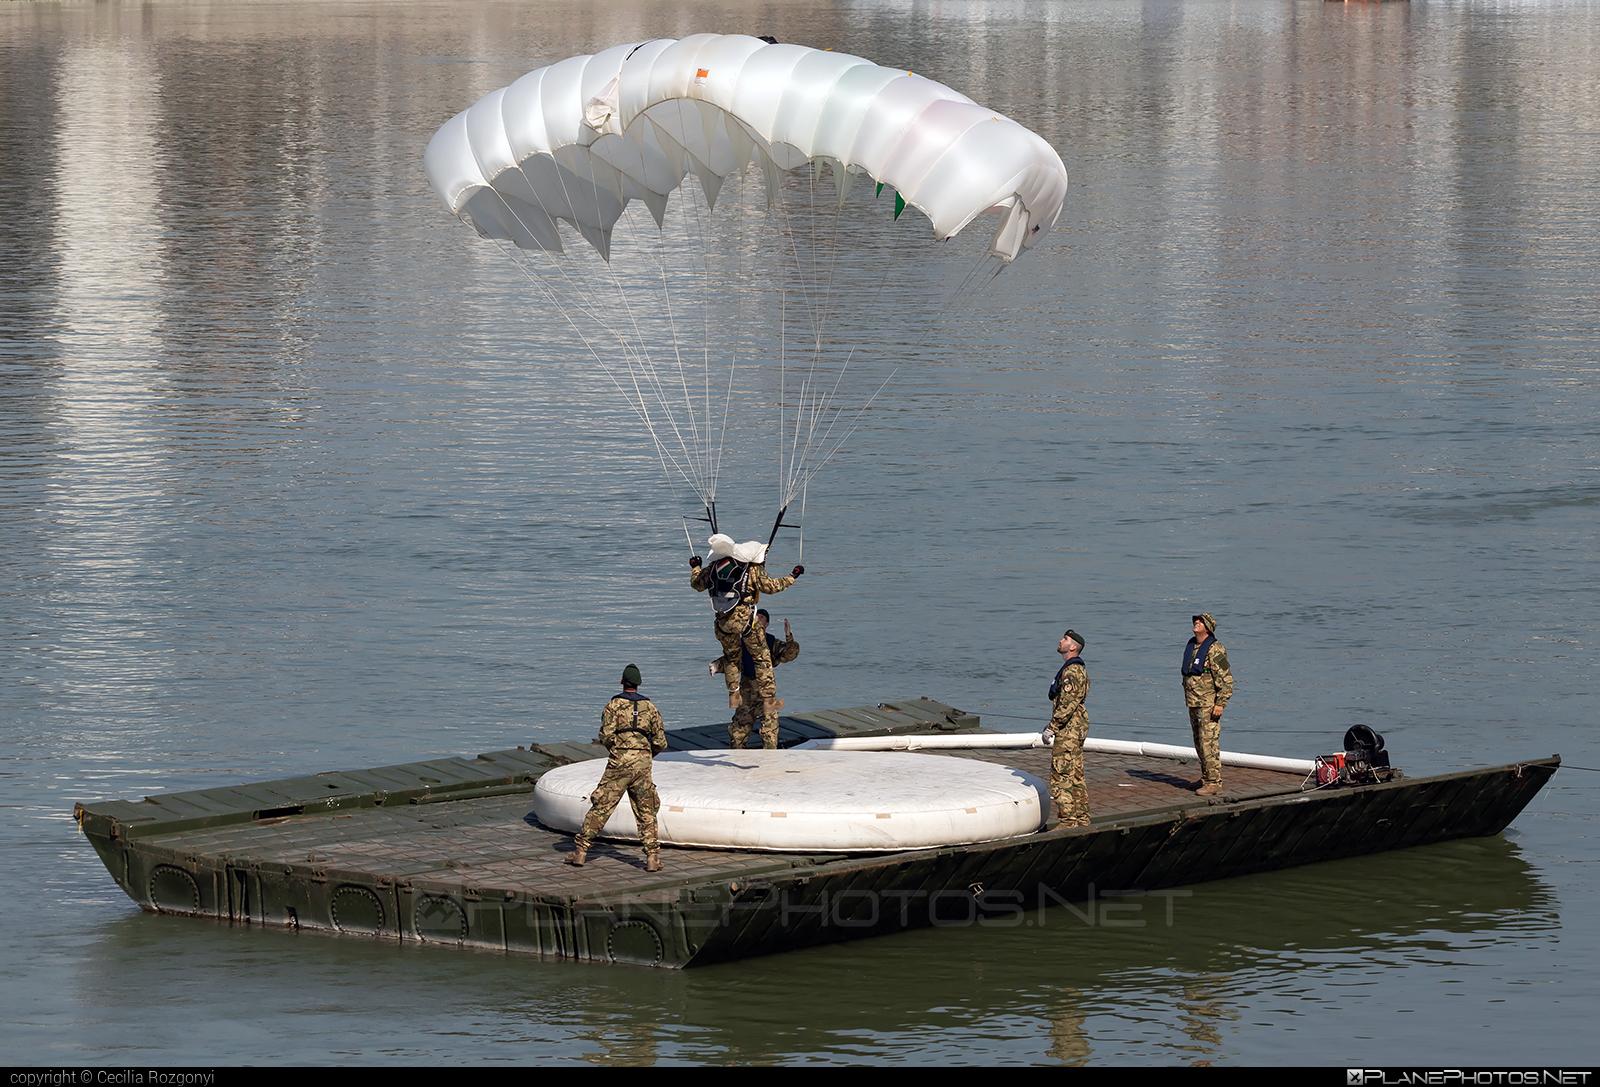 Parachute - No registration operated by Magyar Légierő (Hungarian Air Force) #hungarianairforce #magyarlegiero